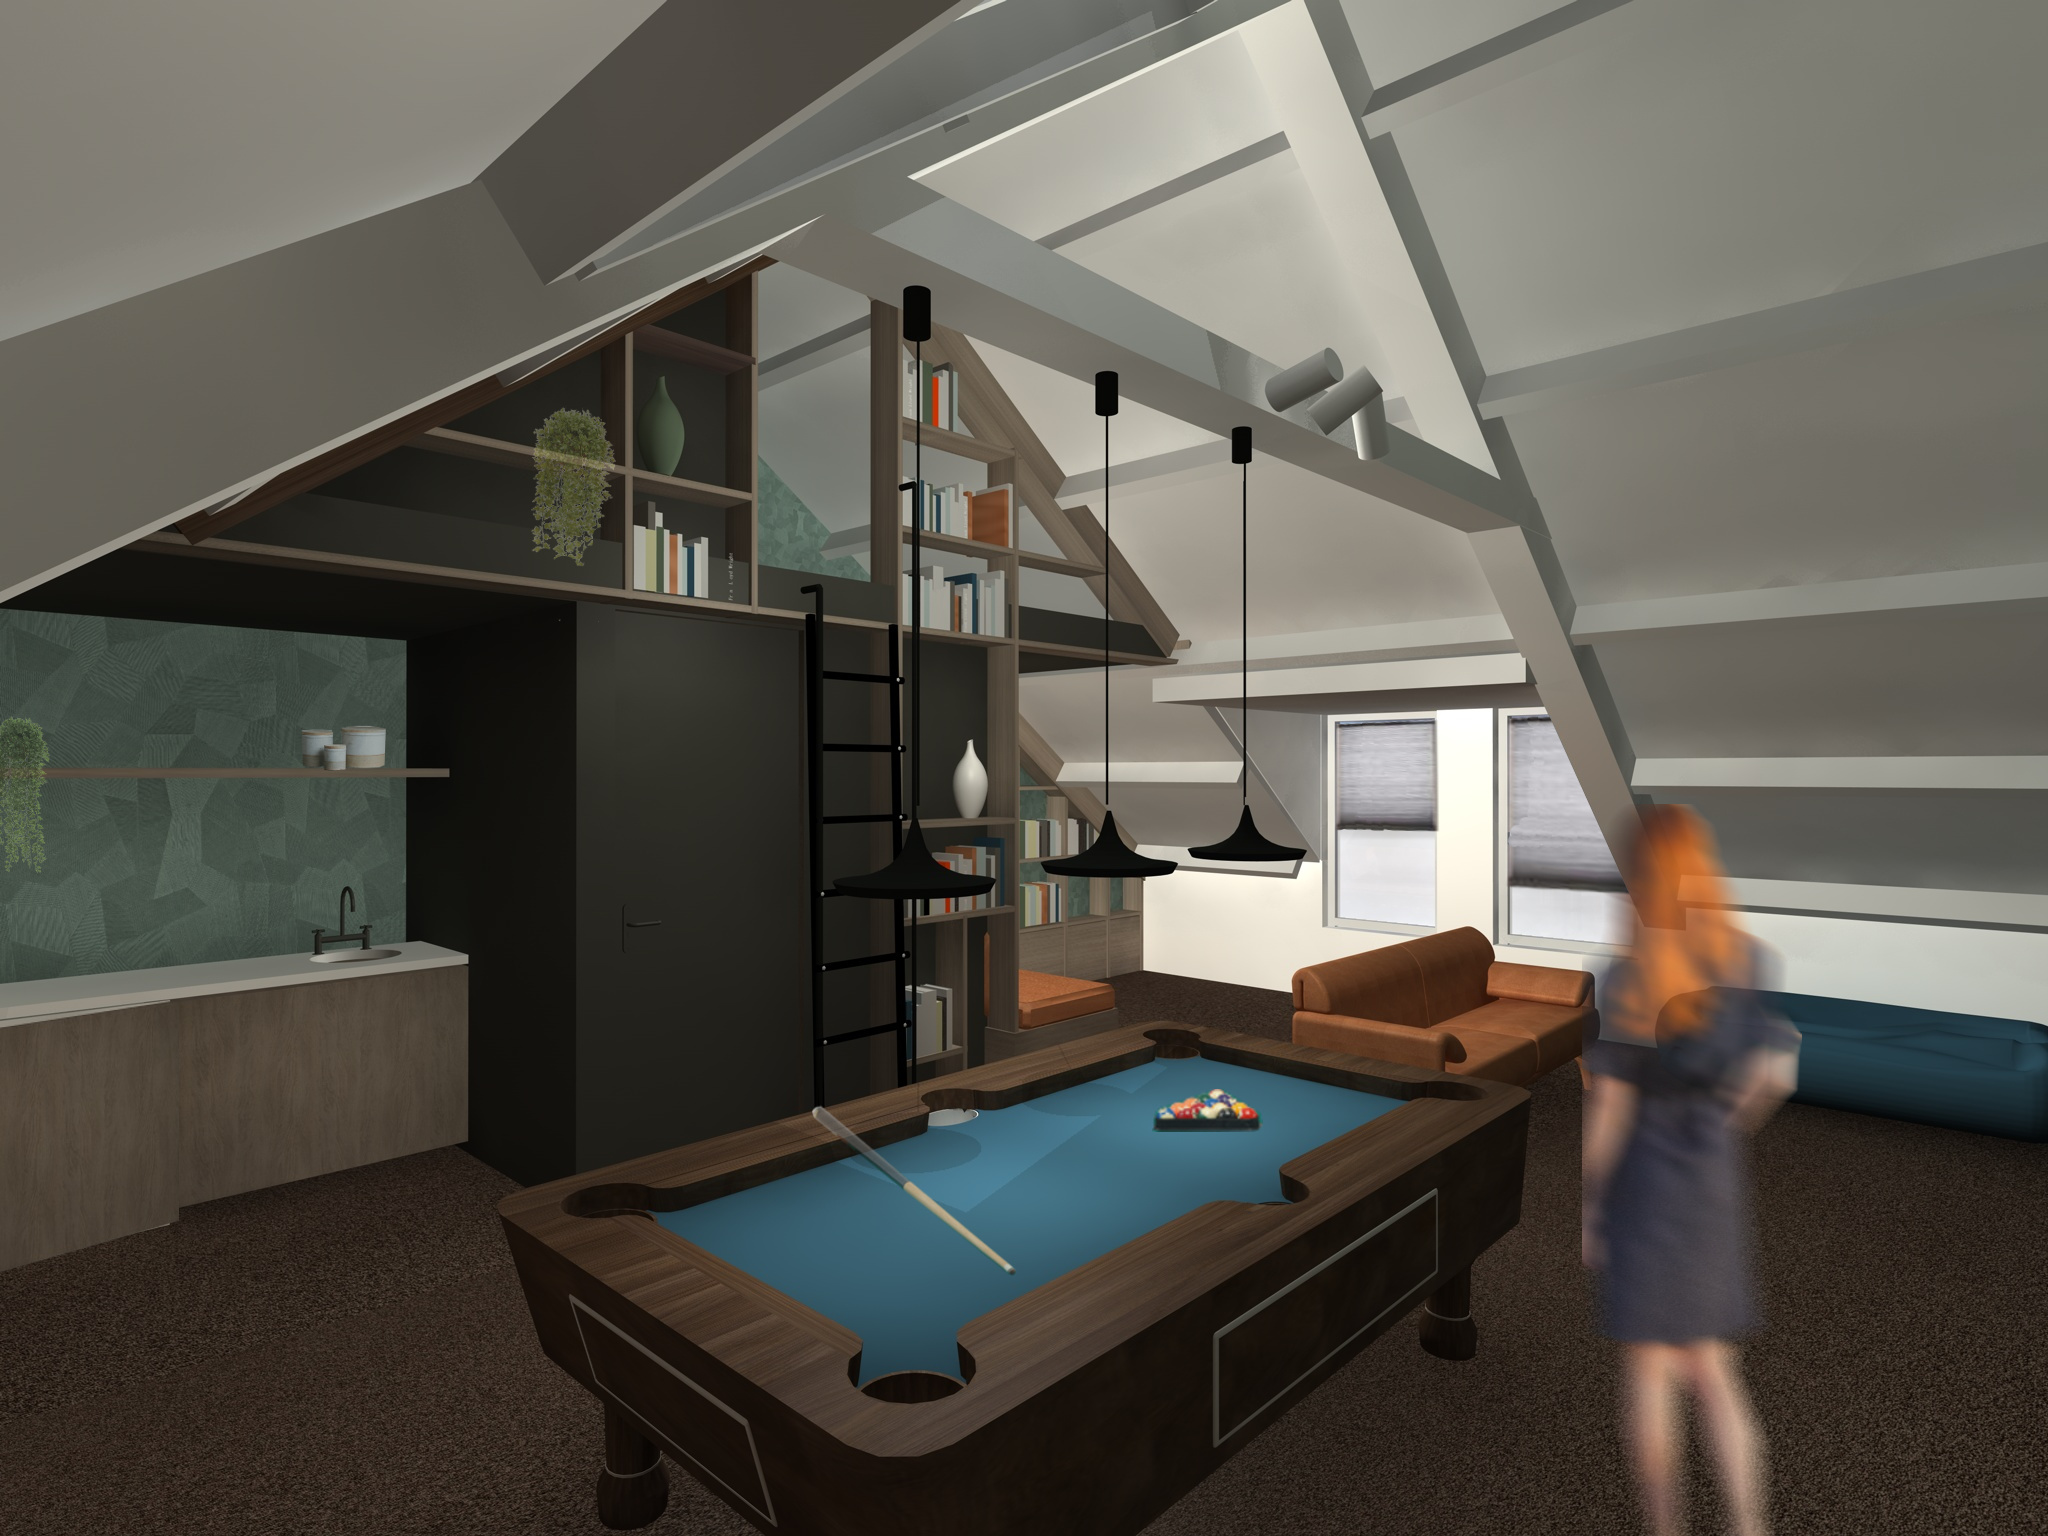 Interieurontwerp – Zolder woonhuis Landgraaf